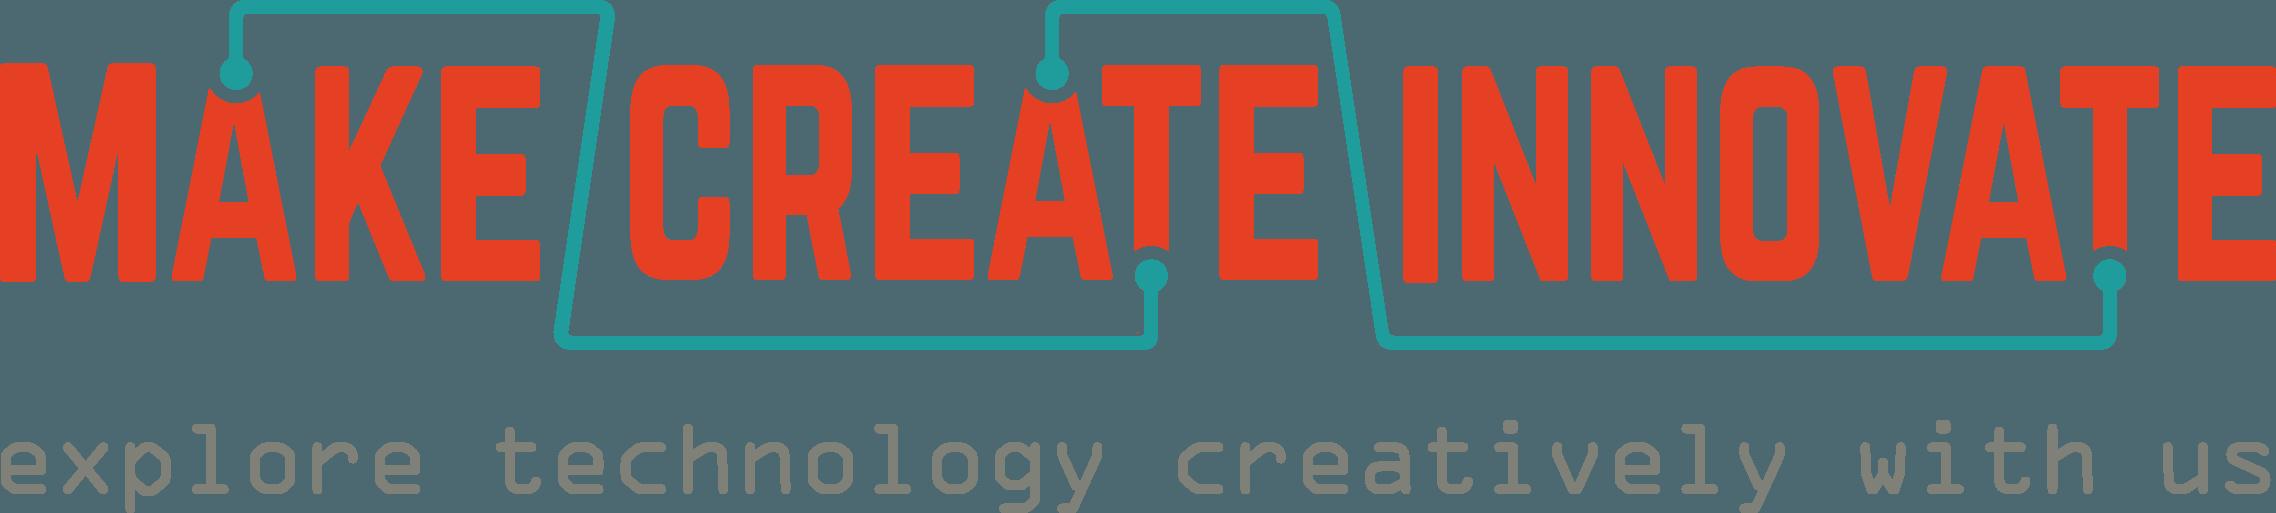 Make Create Innovate